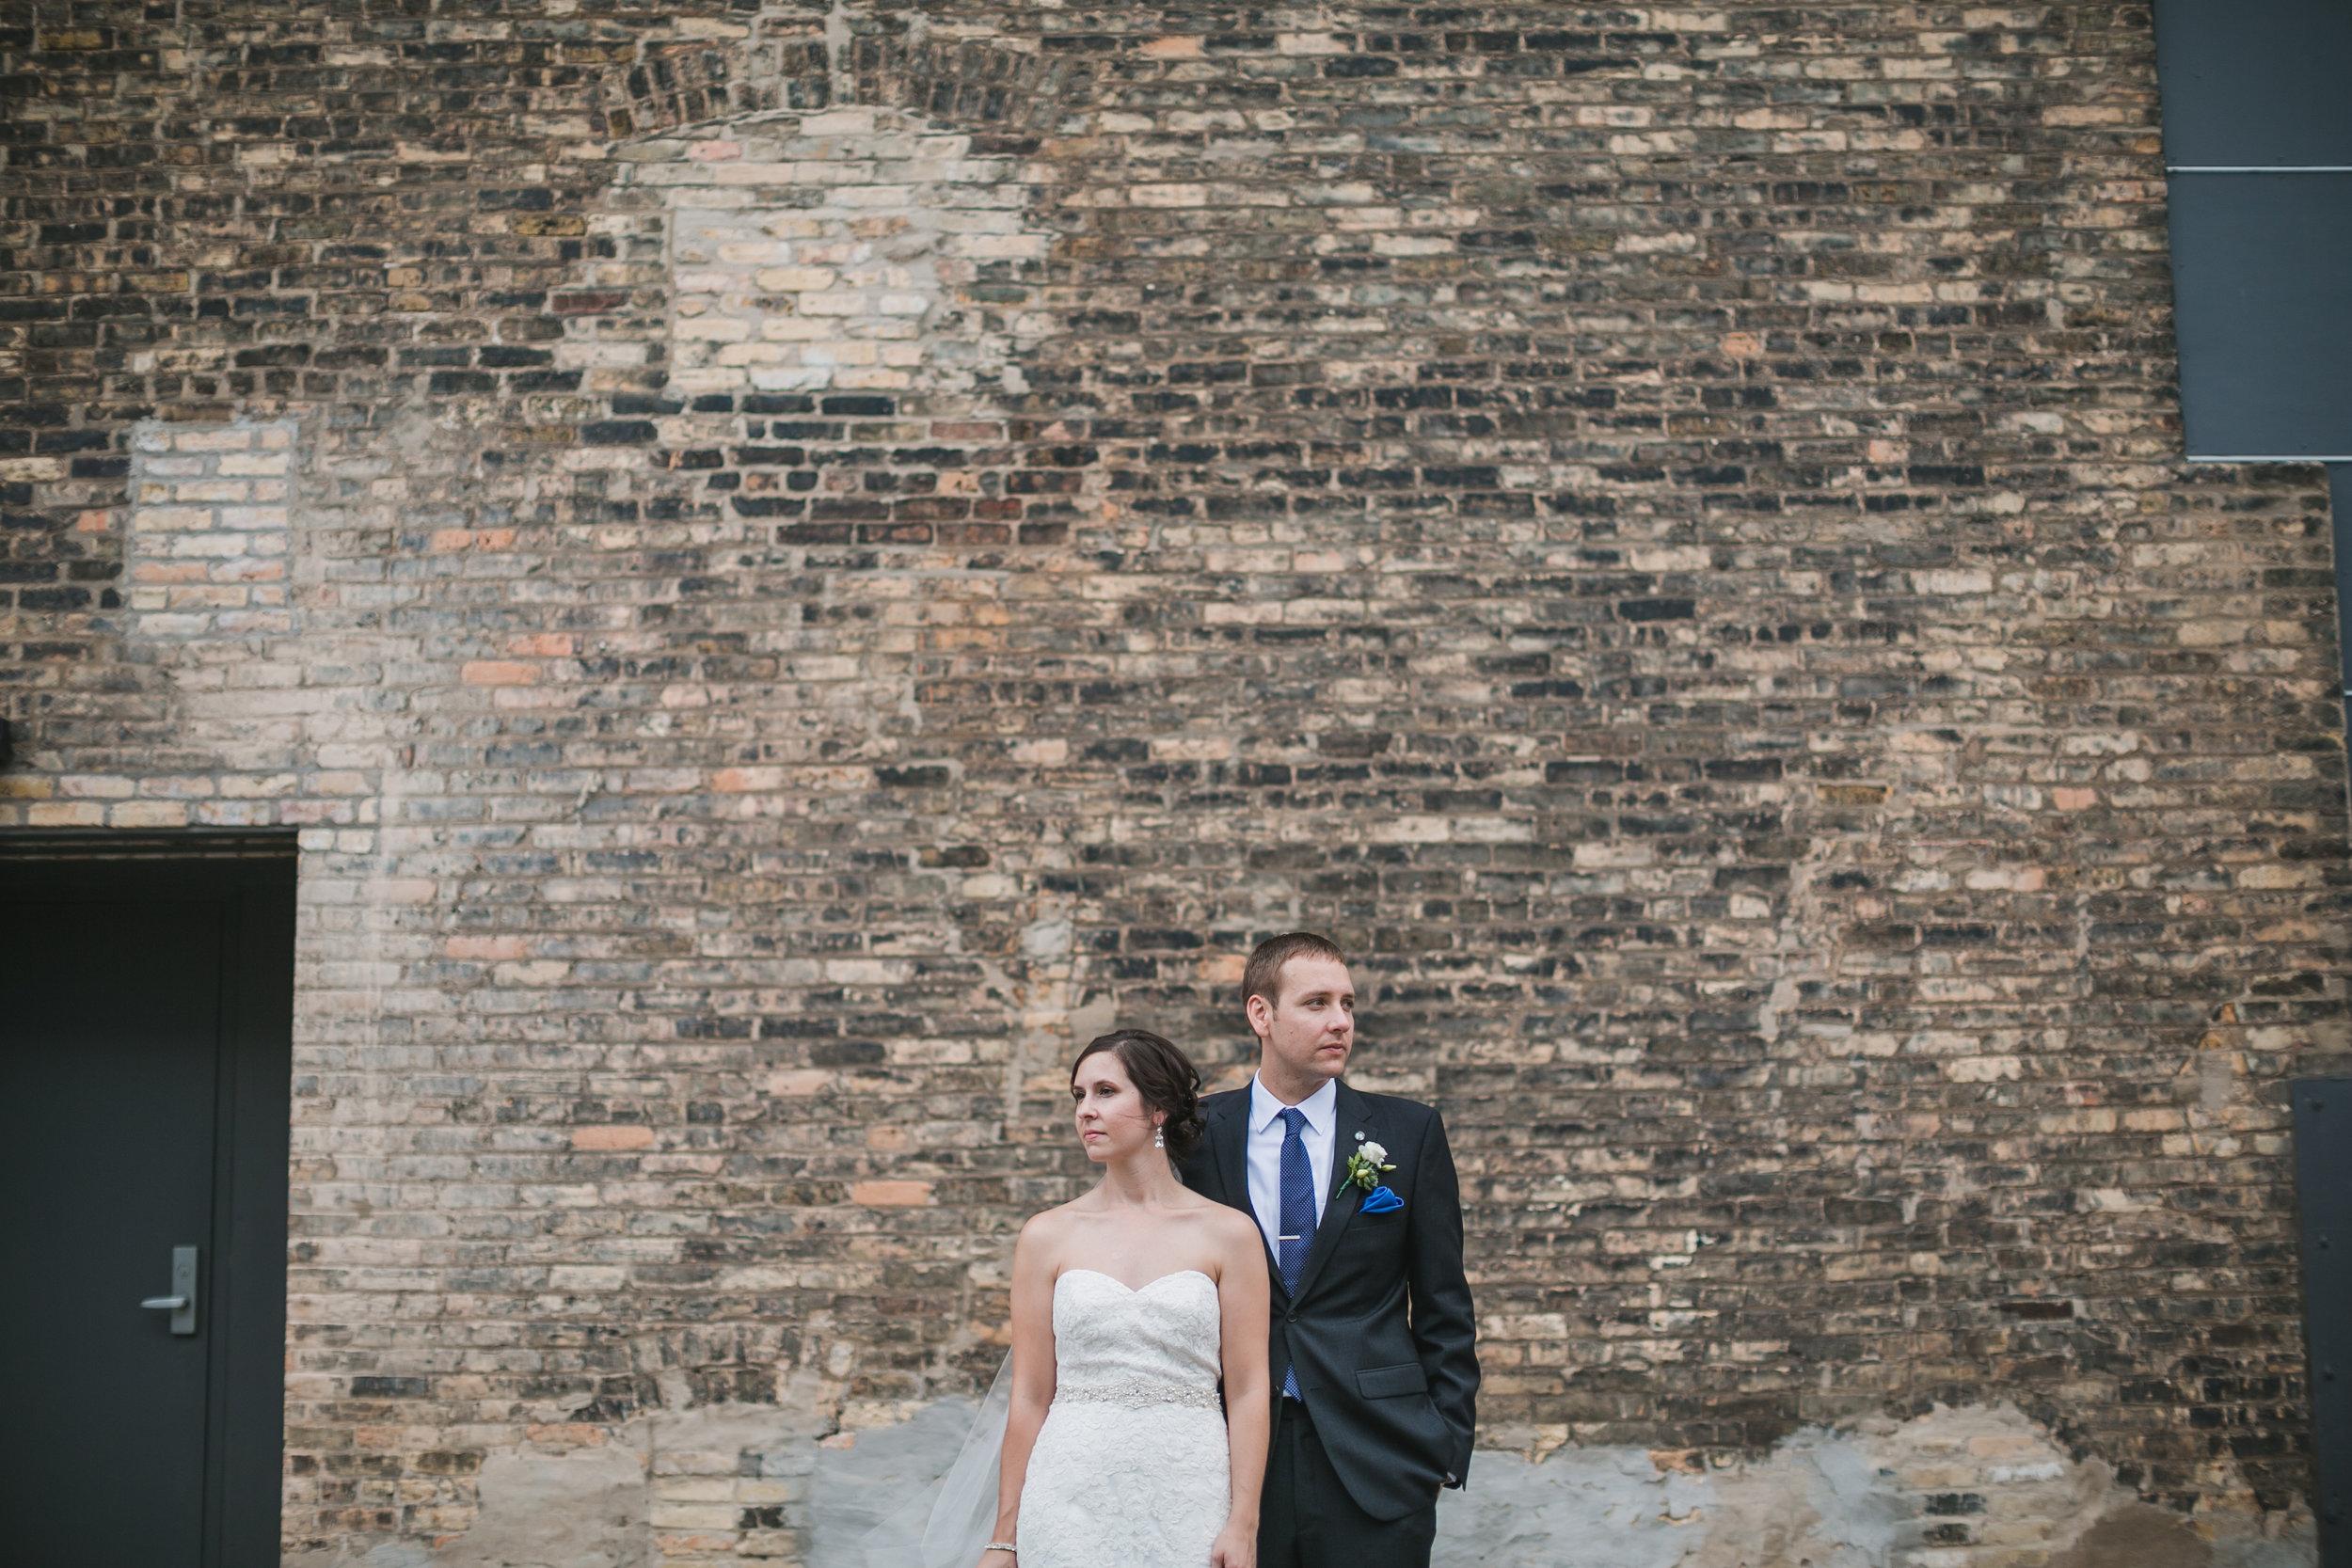 wisconsin-wedding-acowsay-uttke-photography-38.jpg